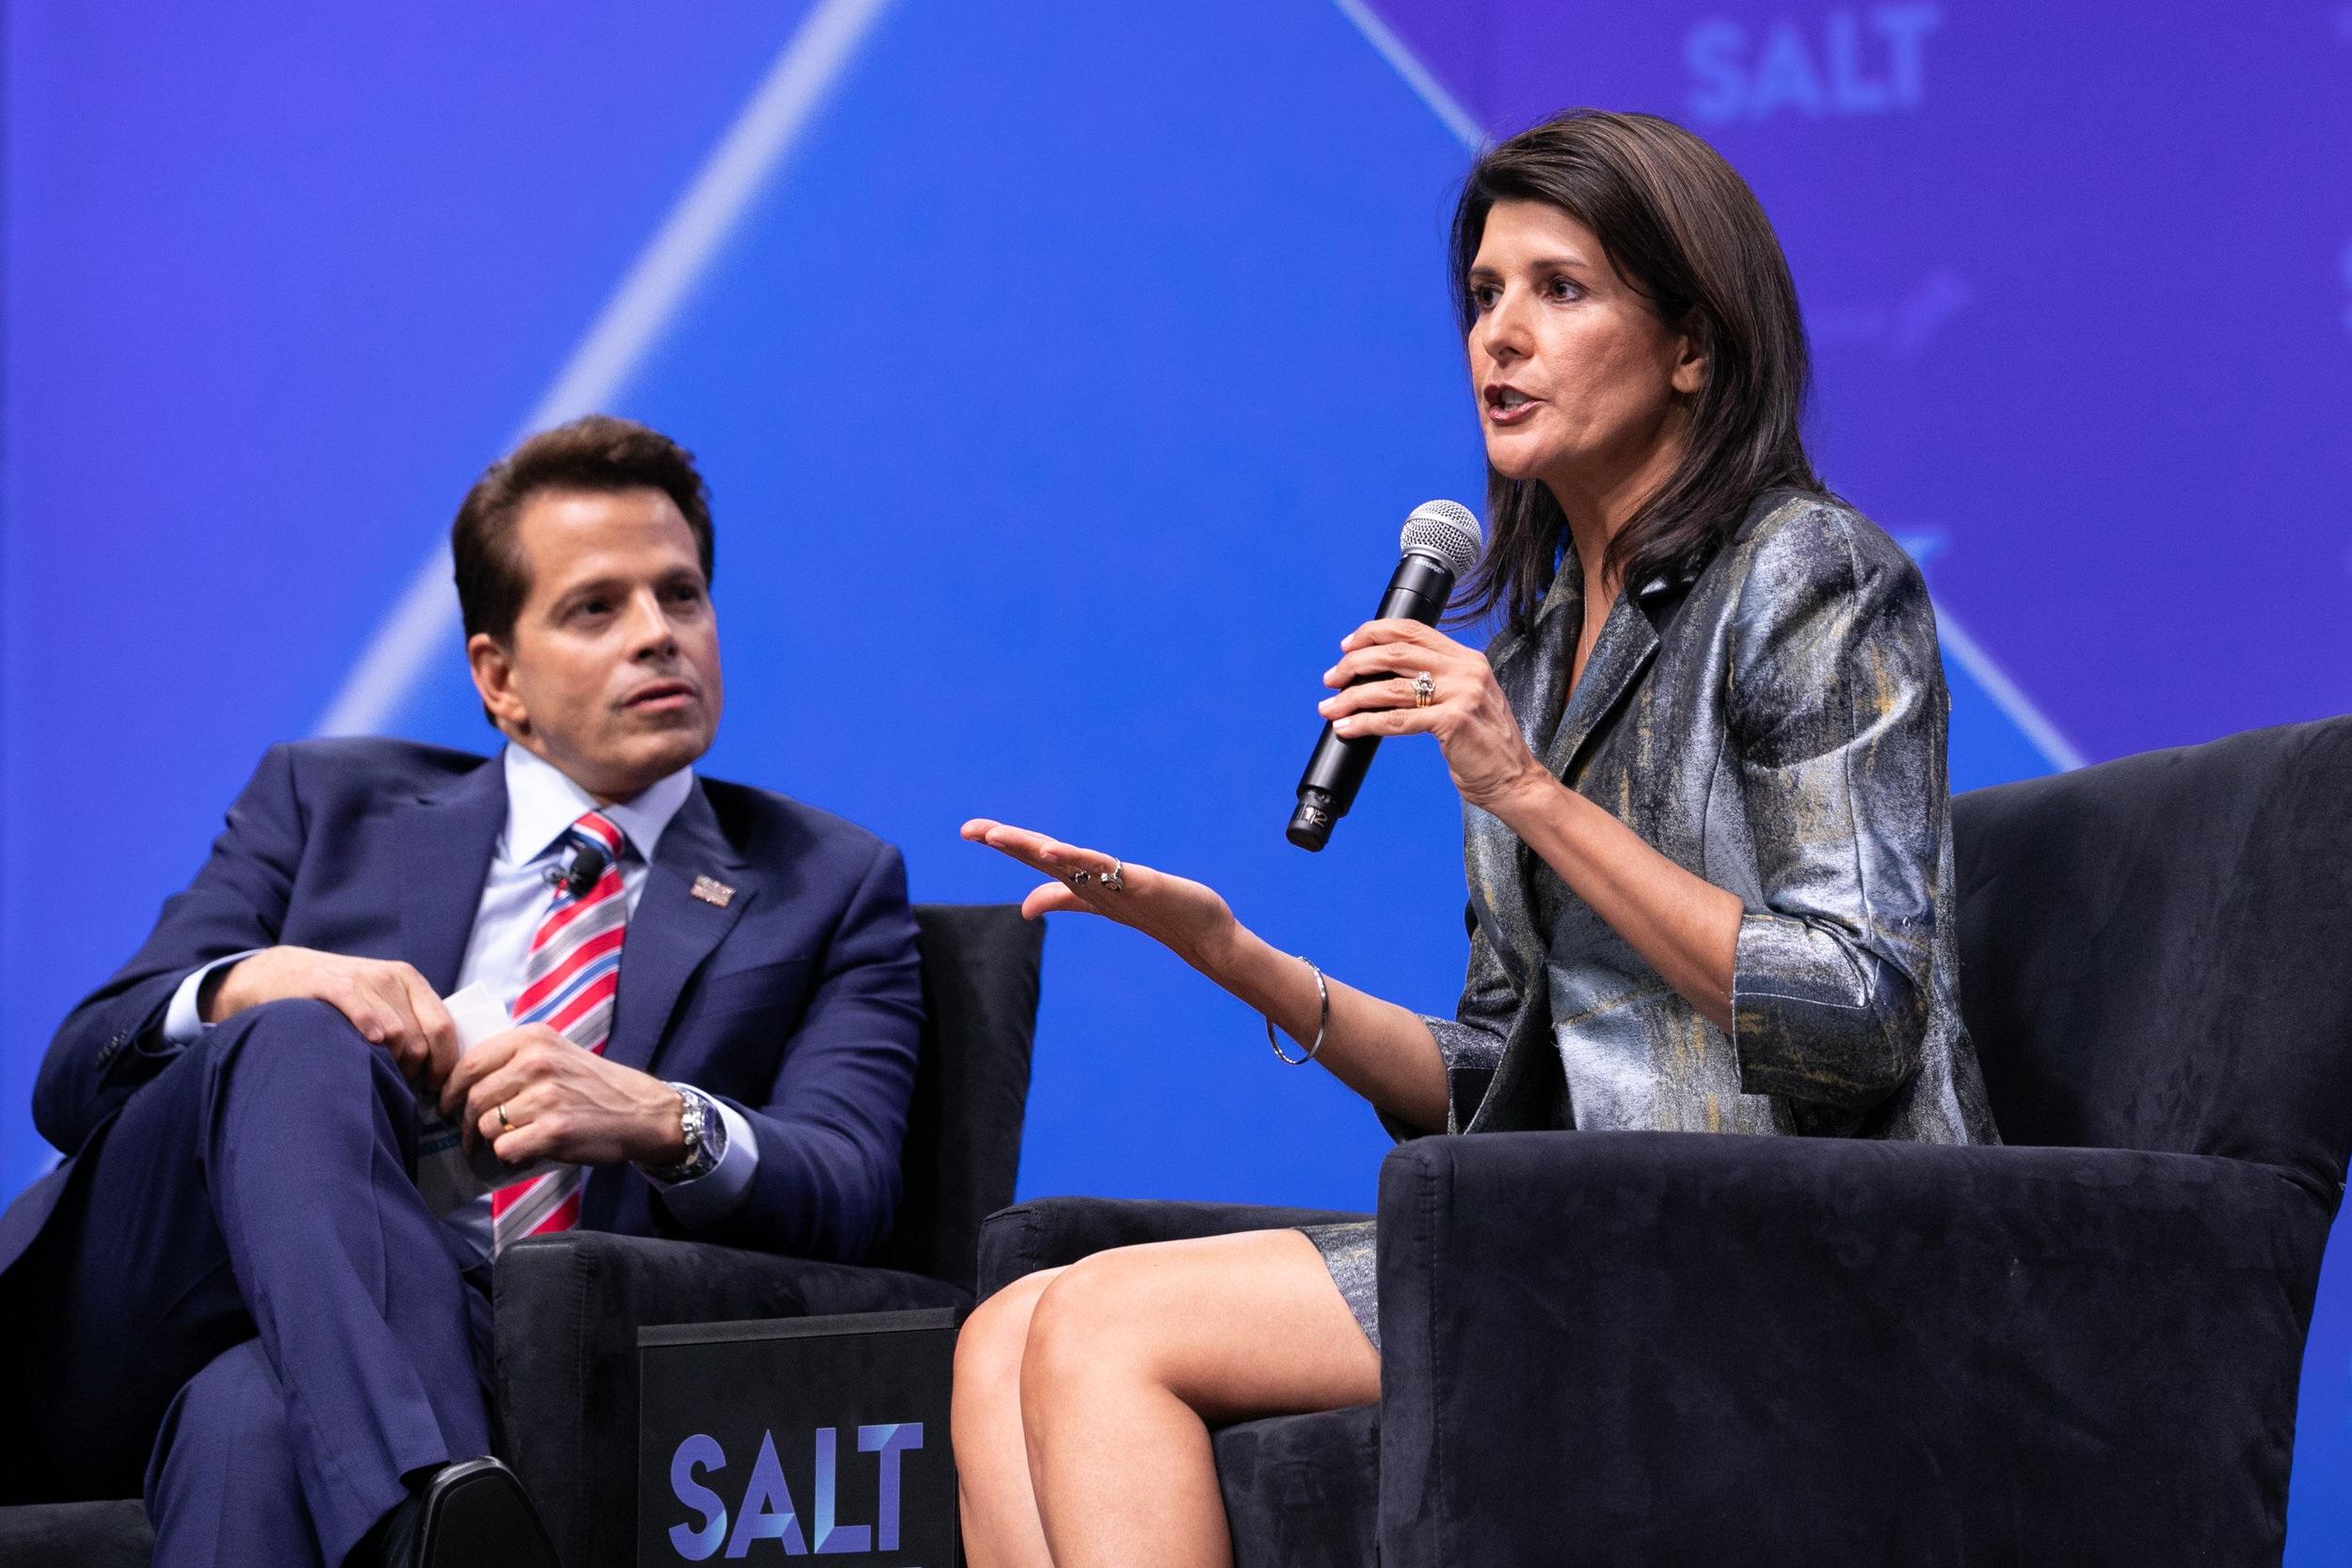 SALT 2019 - U.S. Ambassador to the United Nations (2017-2019) NIKKI HALEY with SkyBridge Founder & Co-Managing Partner ANTHONY SCARAMUCCI